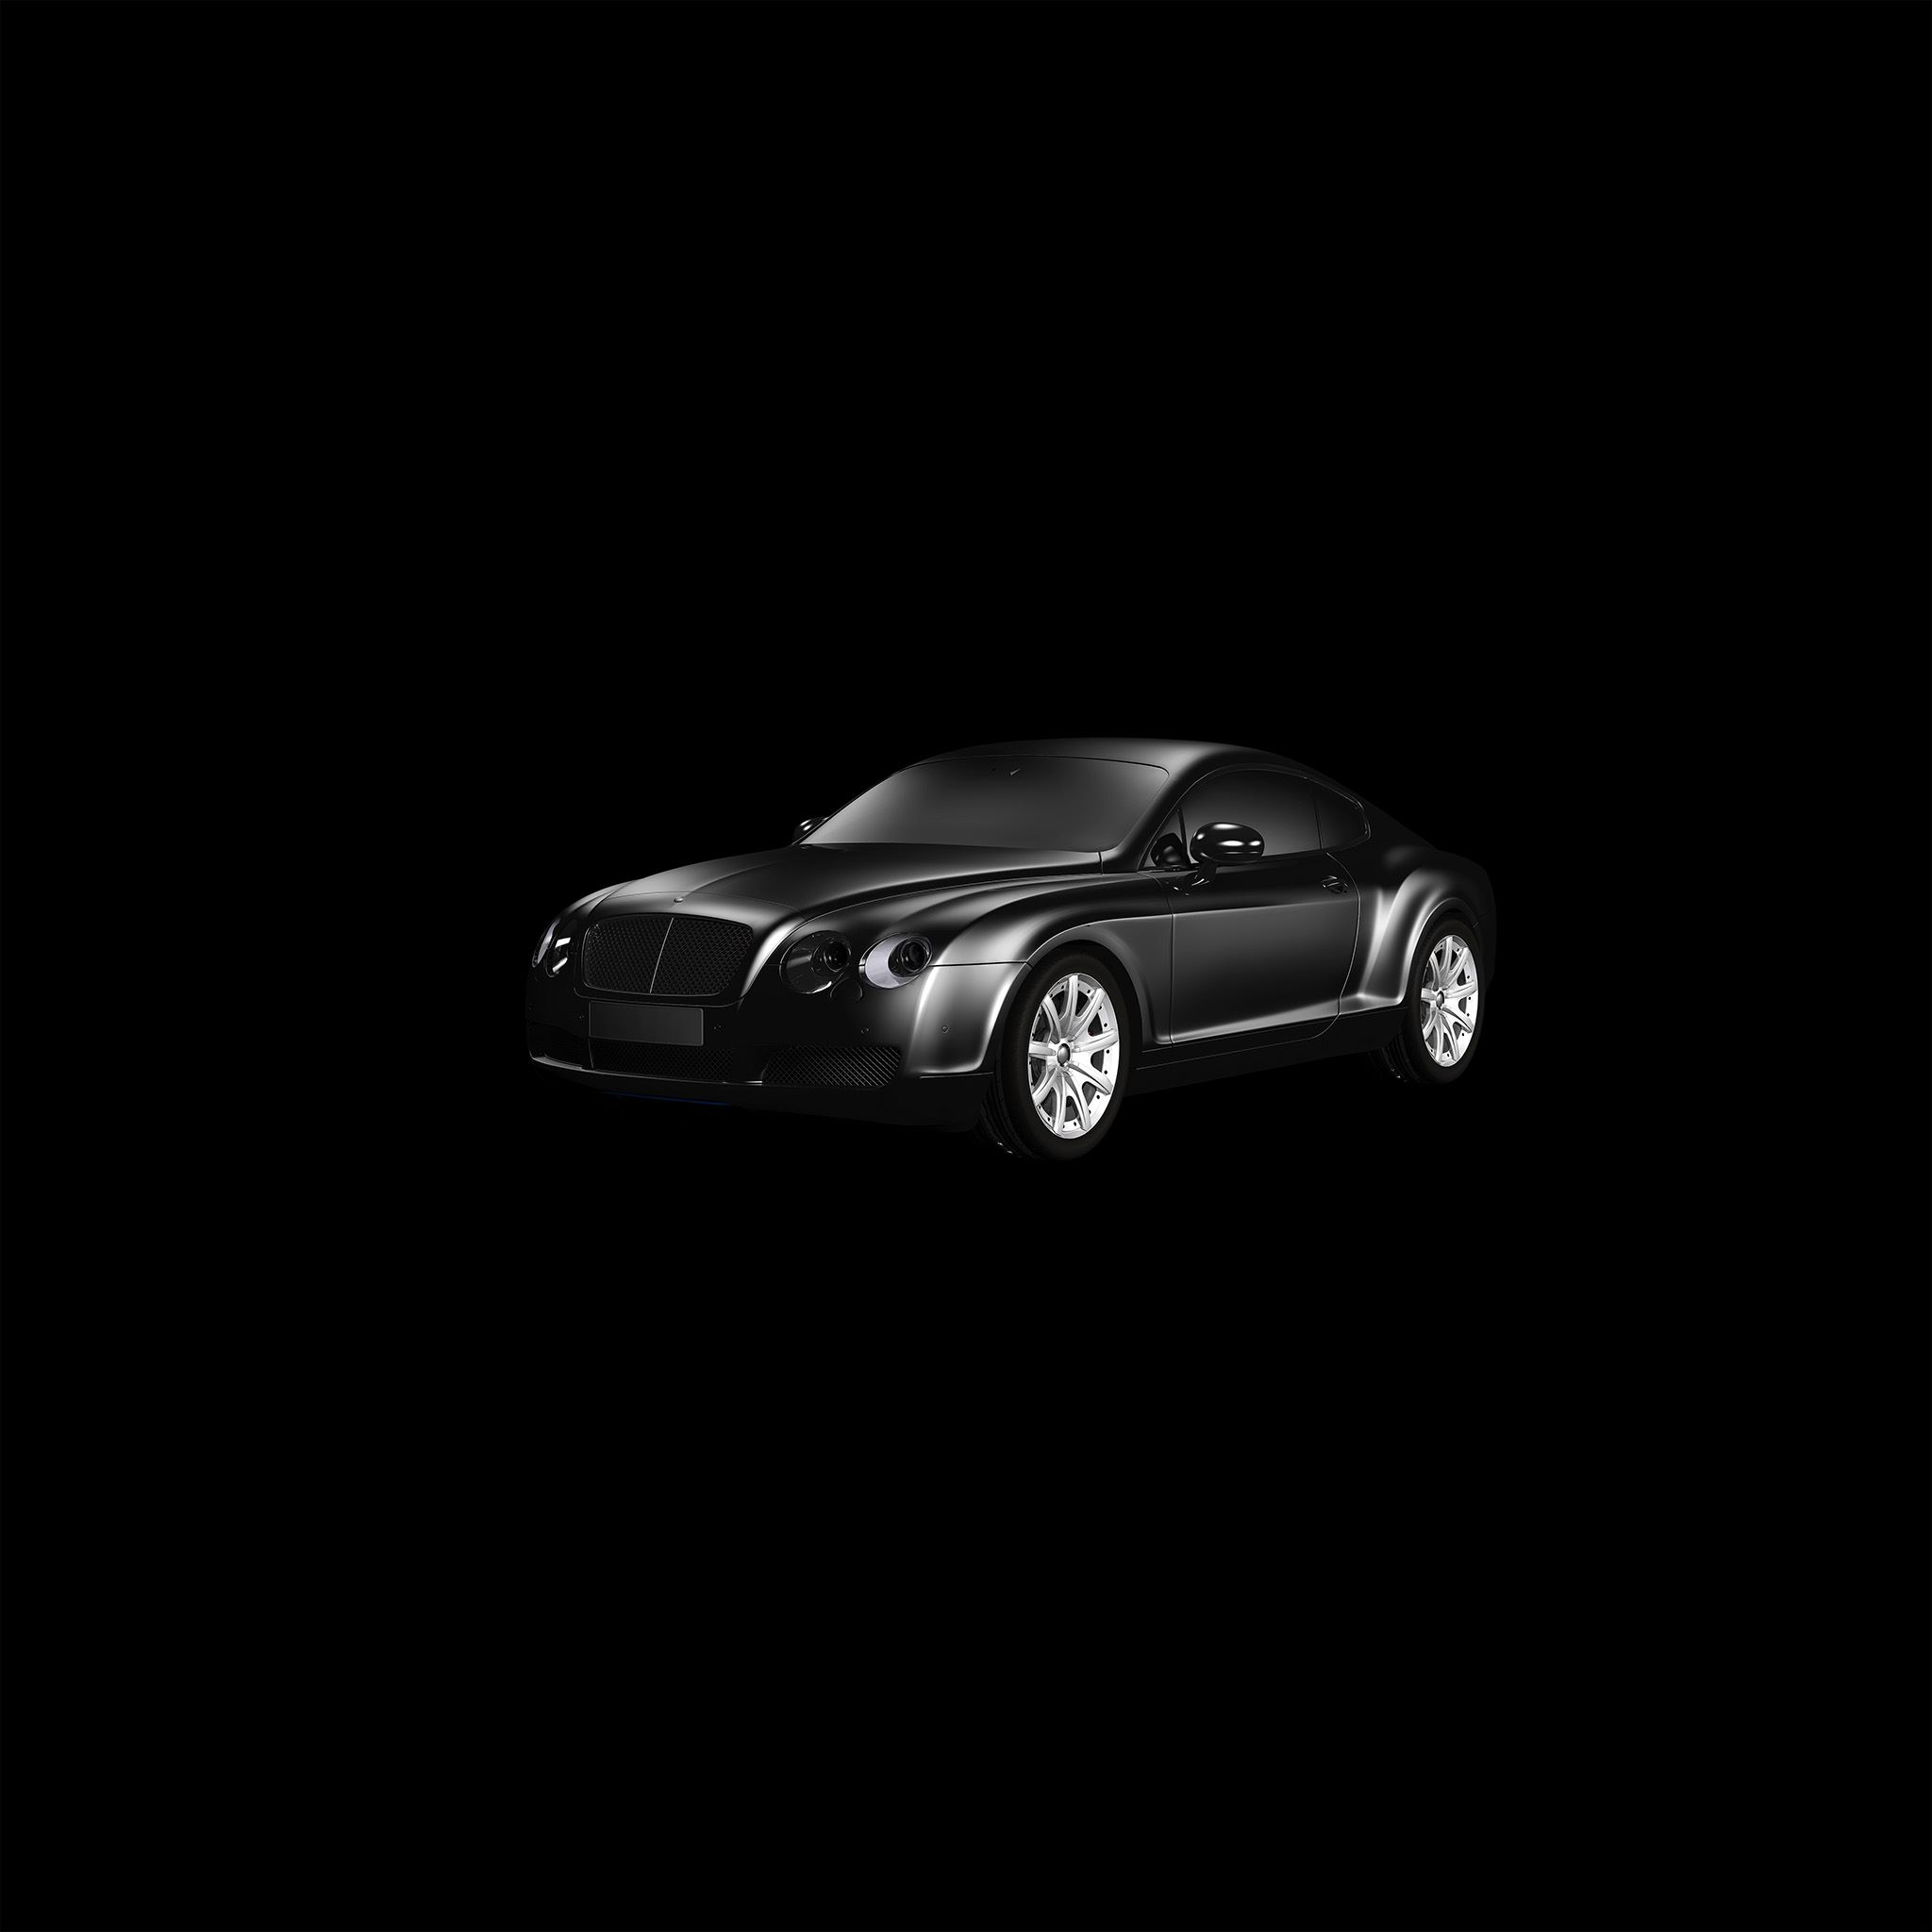 ... Car Bentley Dark Black Limousine Art Illustration IPad Air Wallpaper